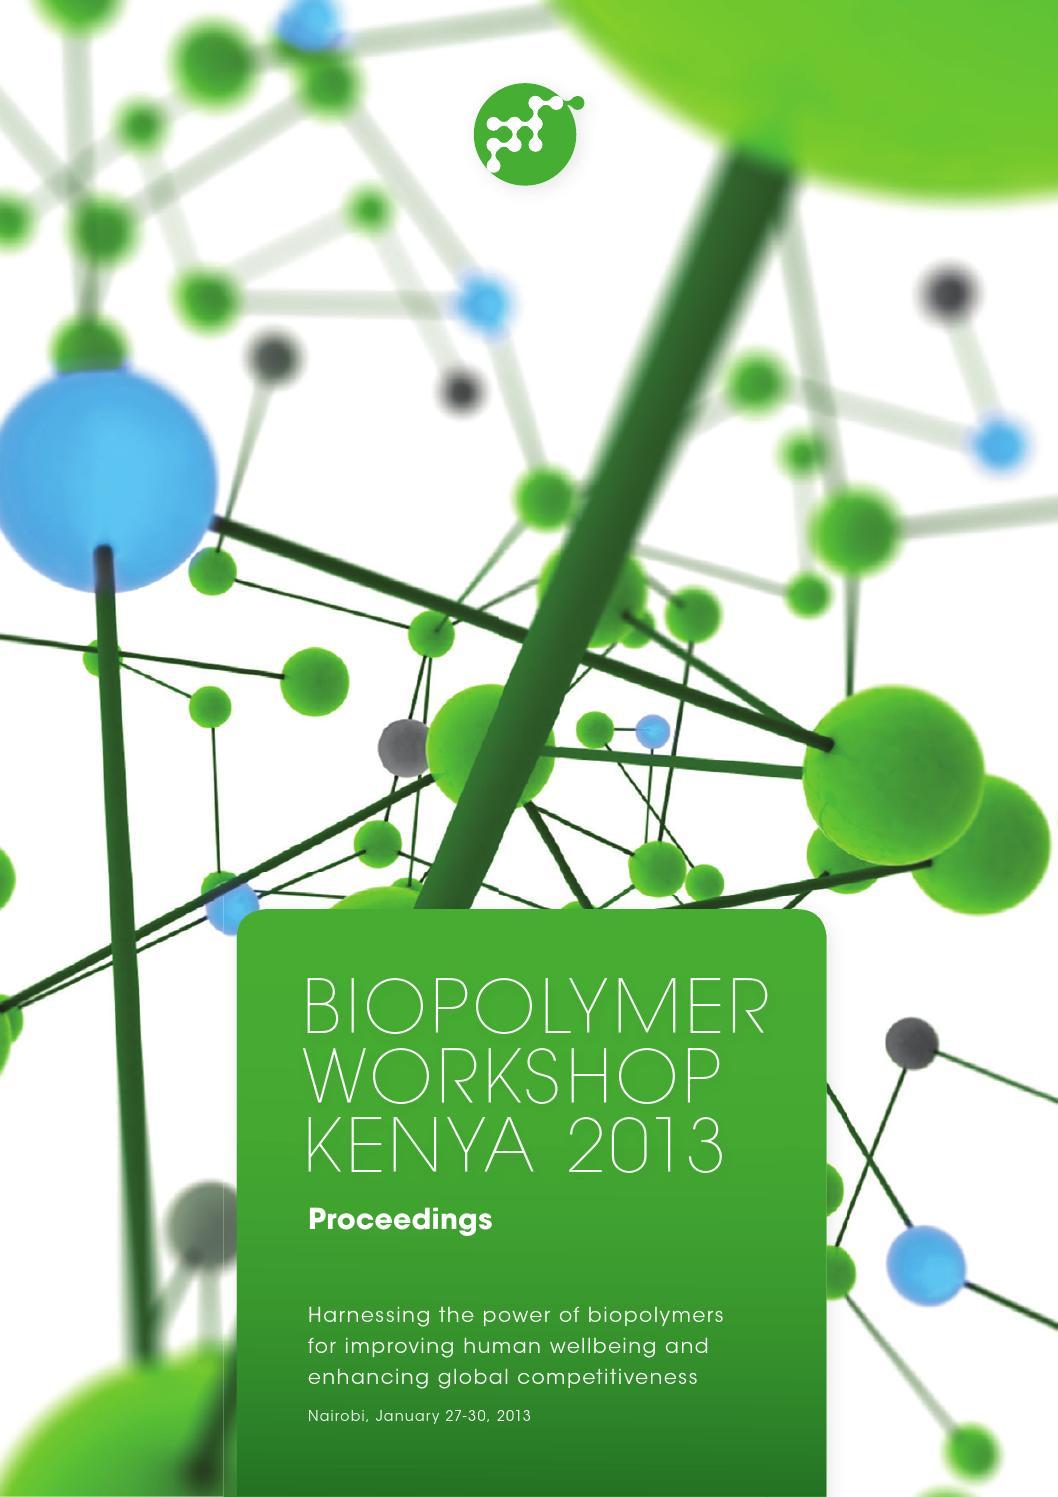 Biopolymer Workshop Kenya 2013 - Proceedings by PoliMaT - issuu